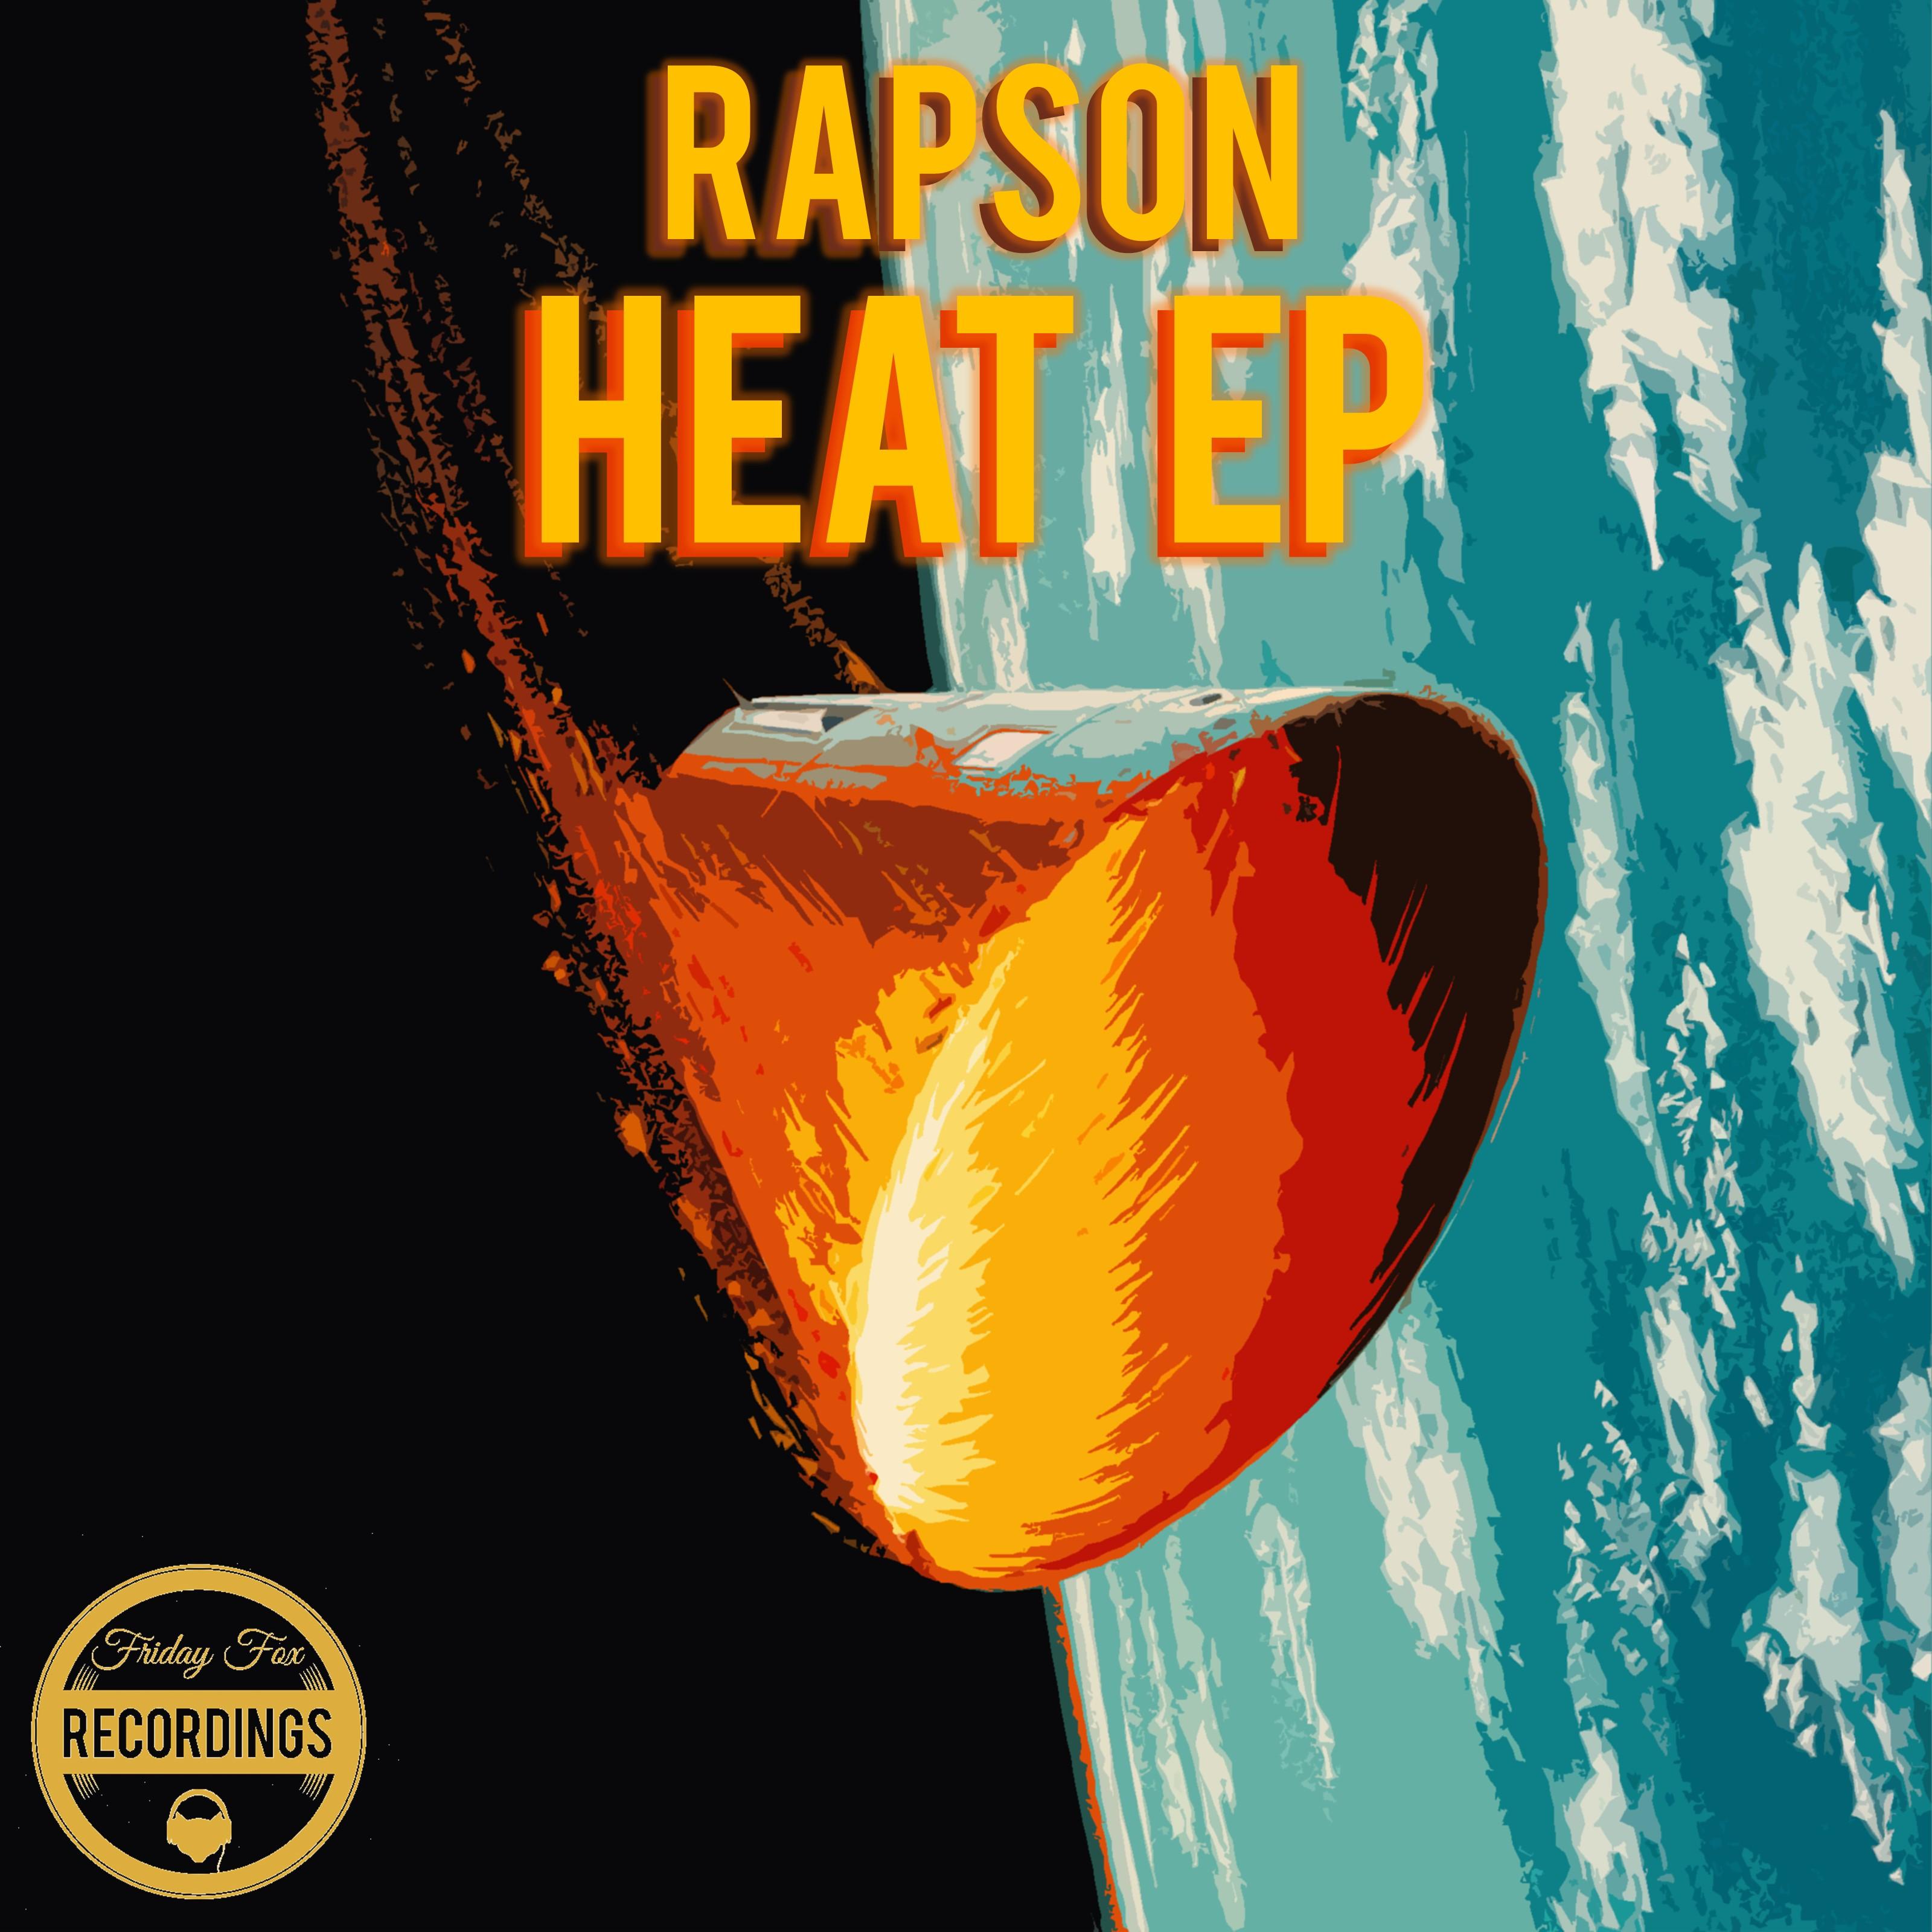 heat_ep_-_rapson_-_cover_image_-_friday_fox_recordings_ff0012.jpg